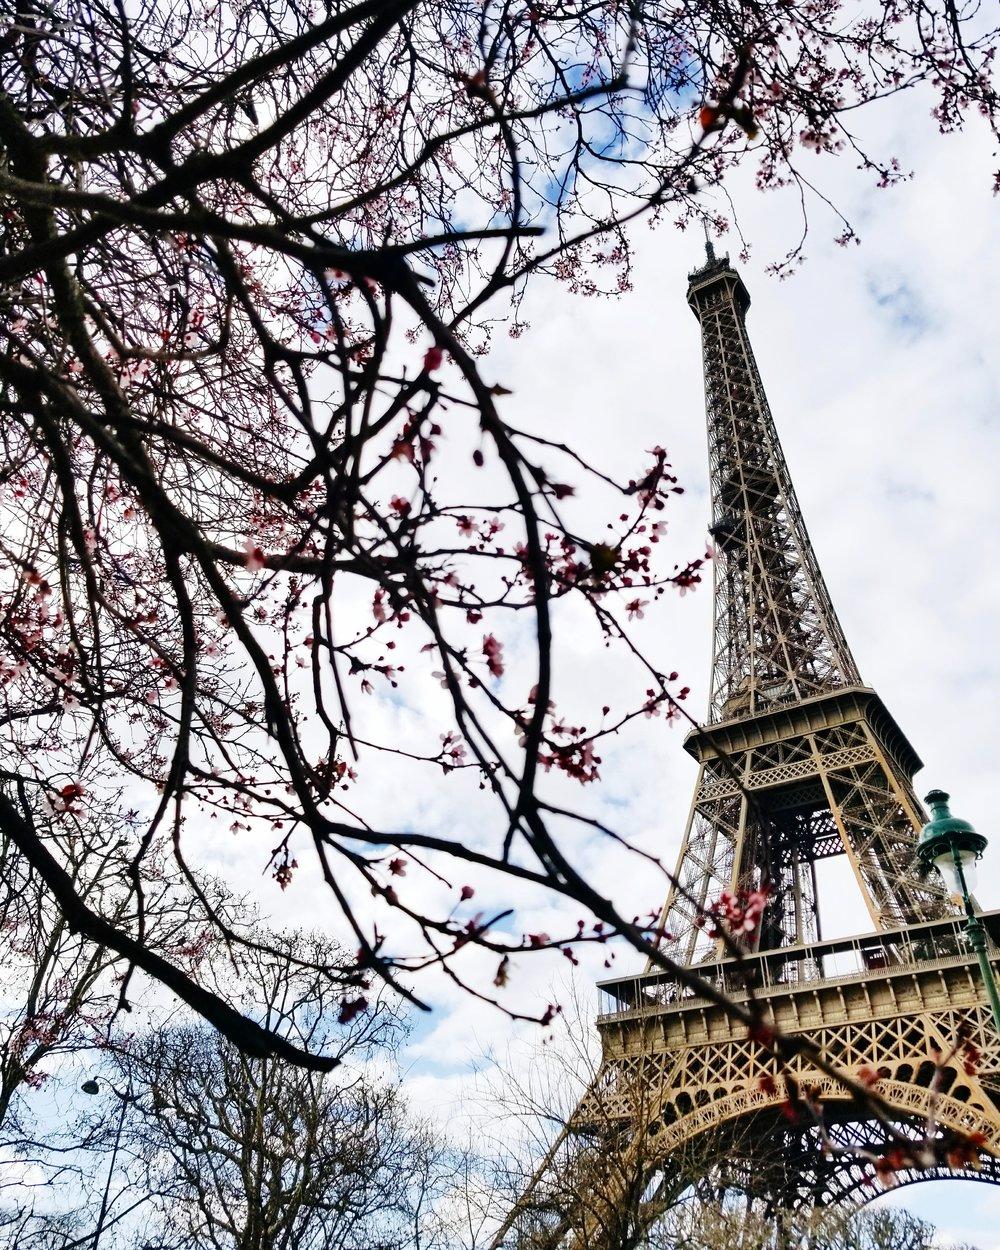 postcards-from-paris-eiffel-tower.jpg